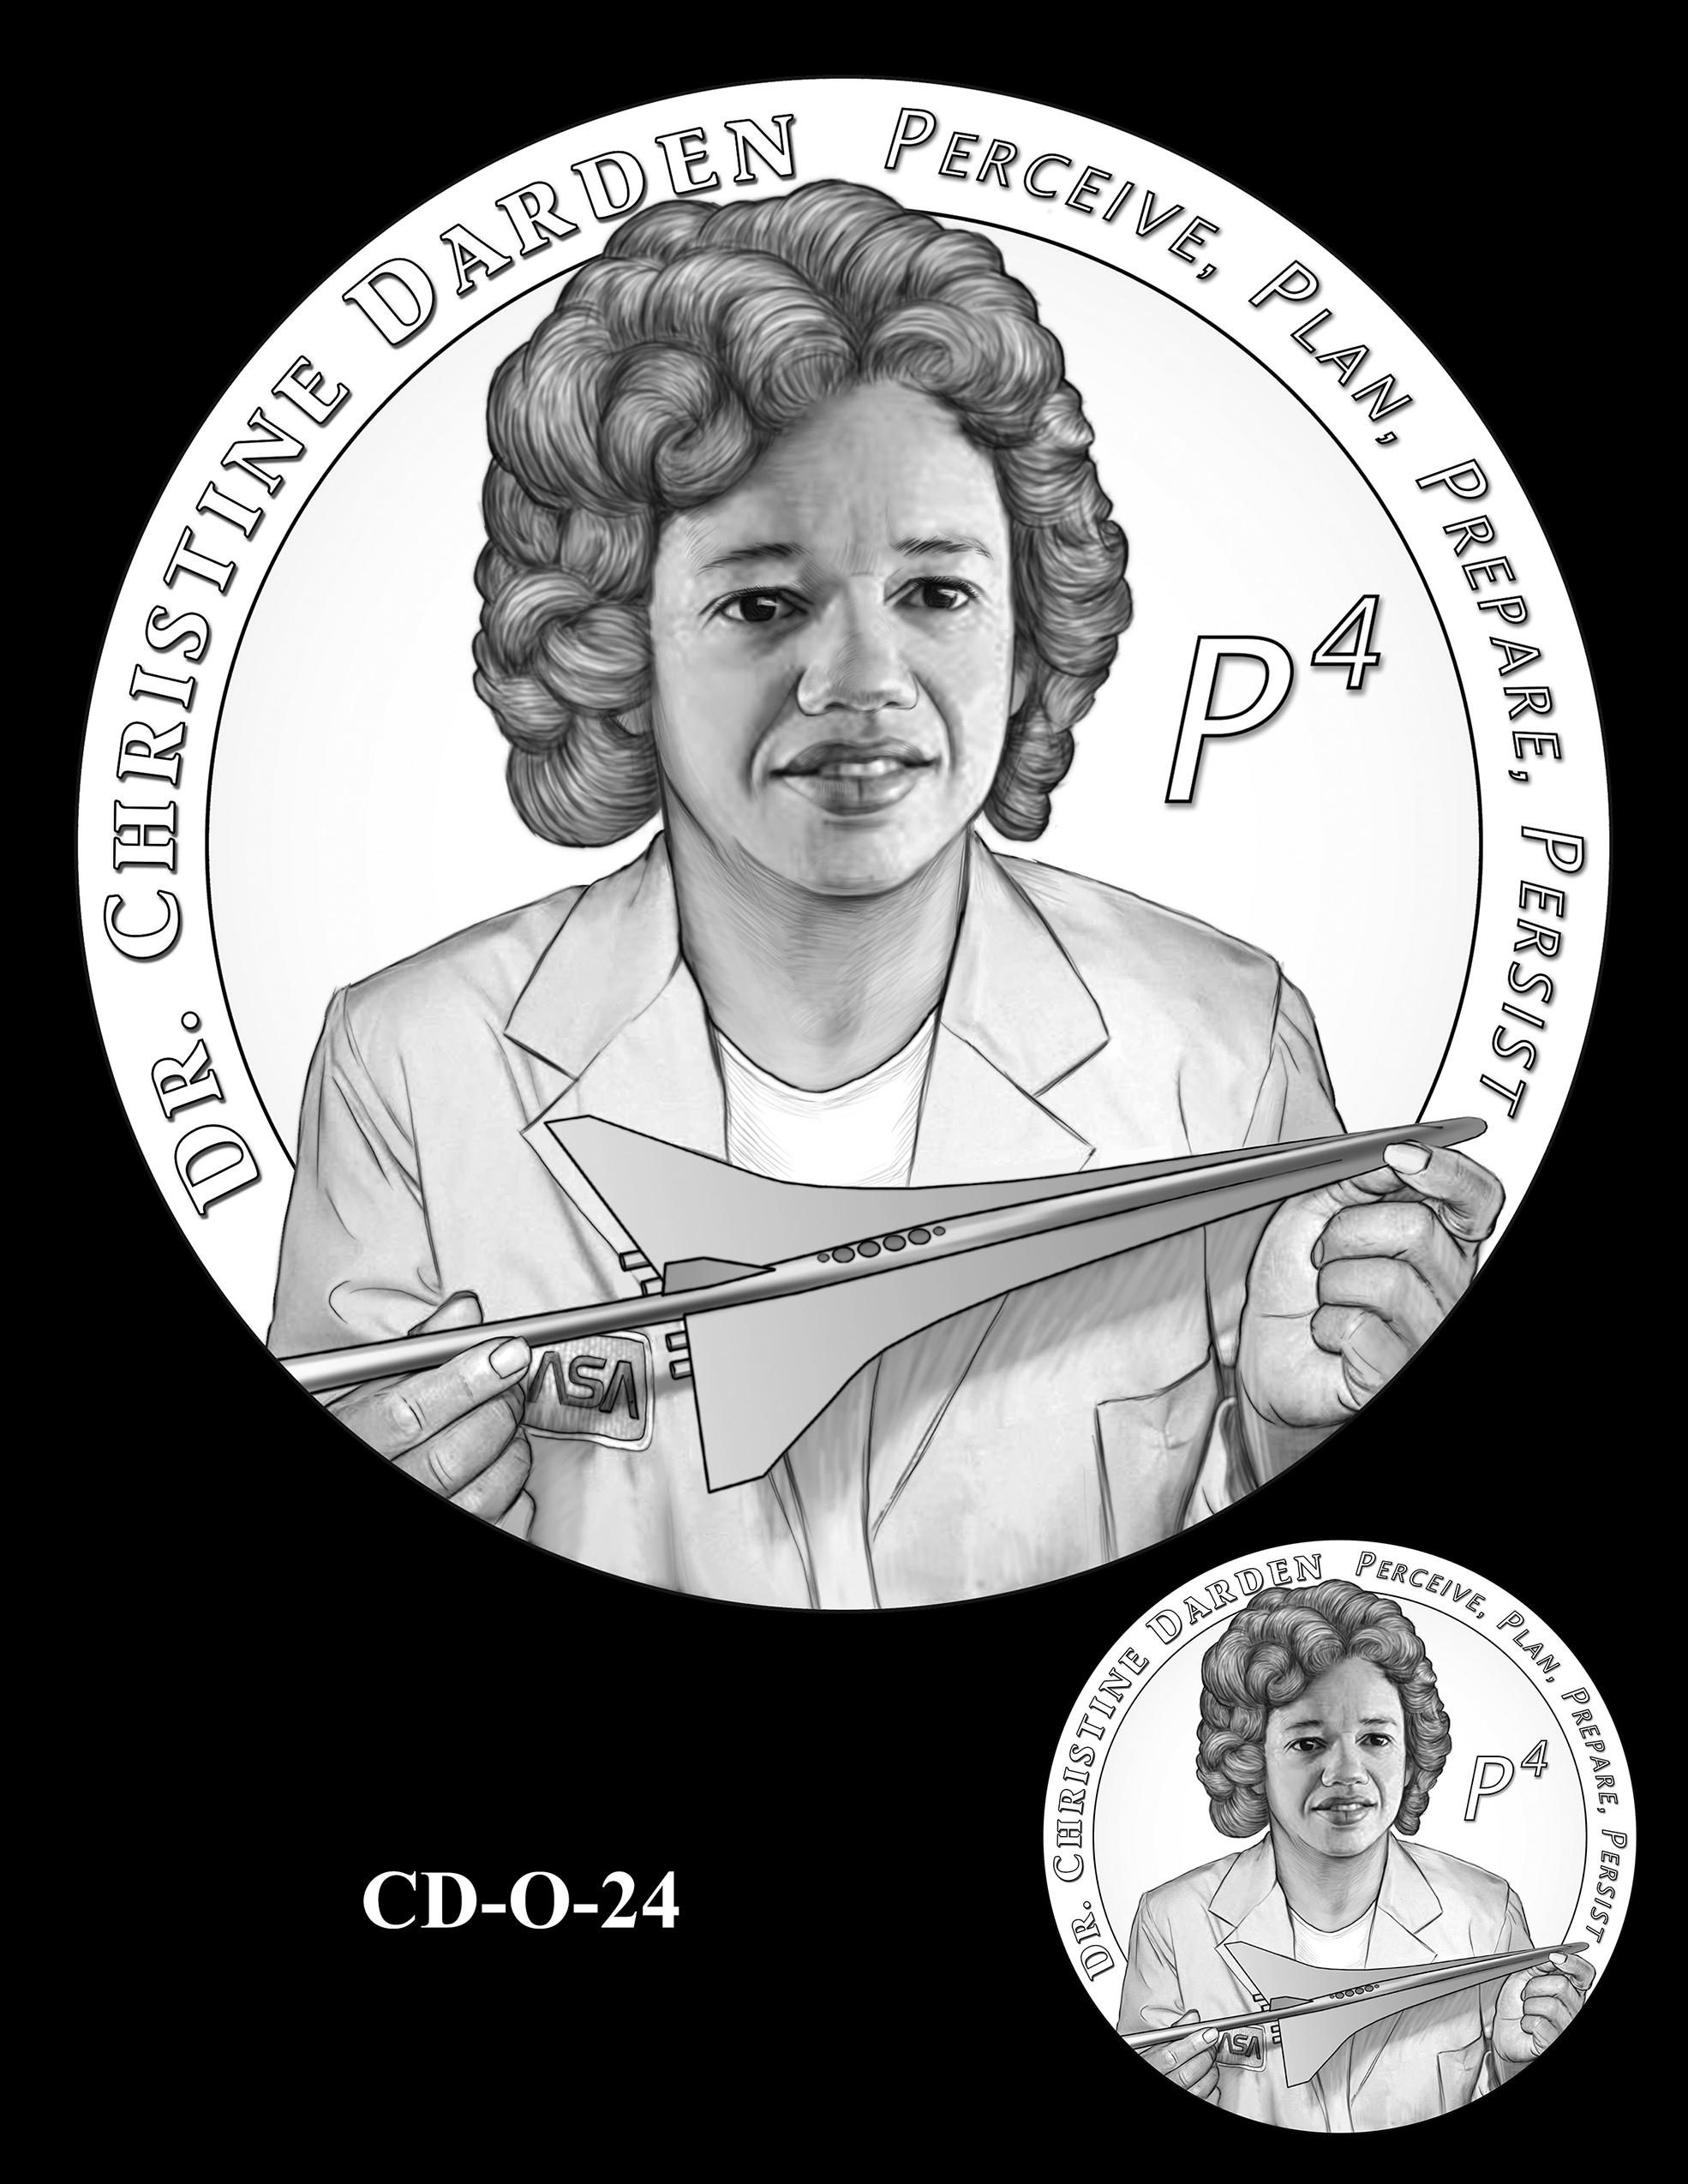 CD-O-24 -- Dr. Christine Darden Congressional Gold Medal